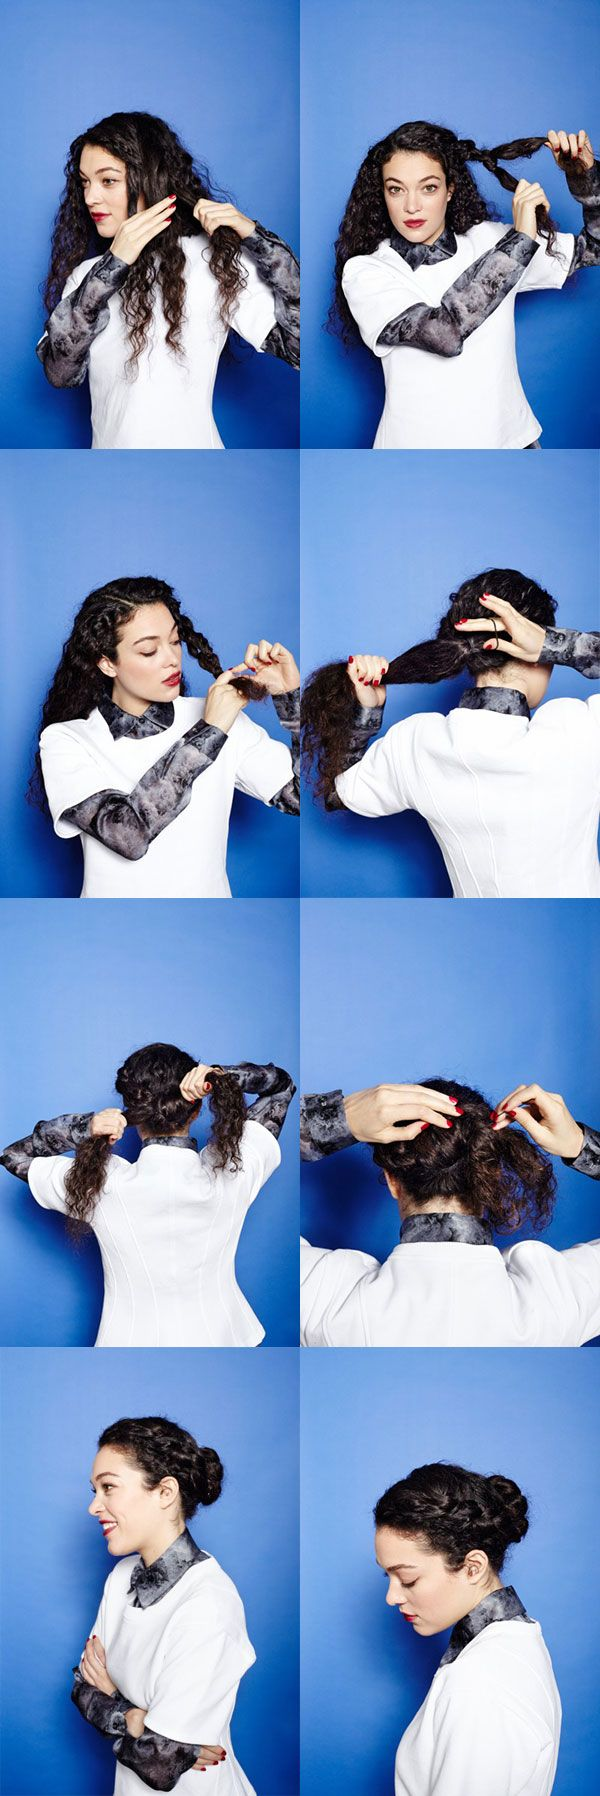 Cachos, penteados e cortes p/grandes cabeleiras.